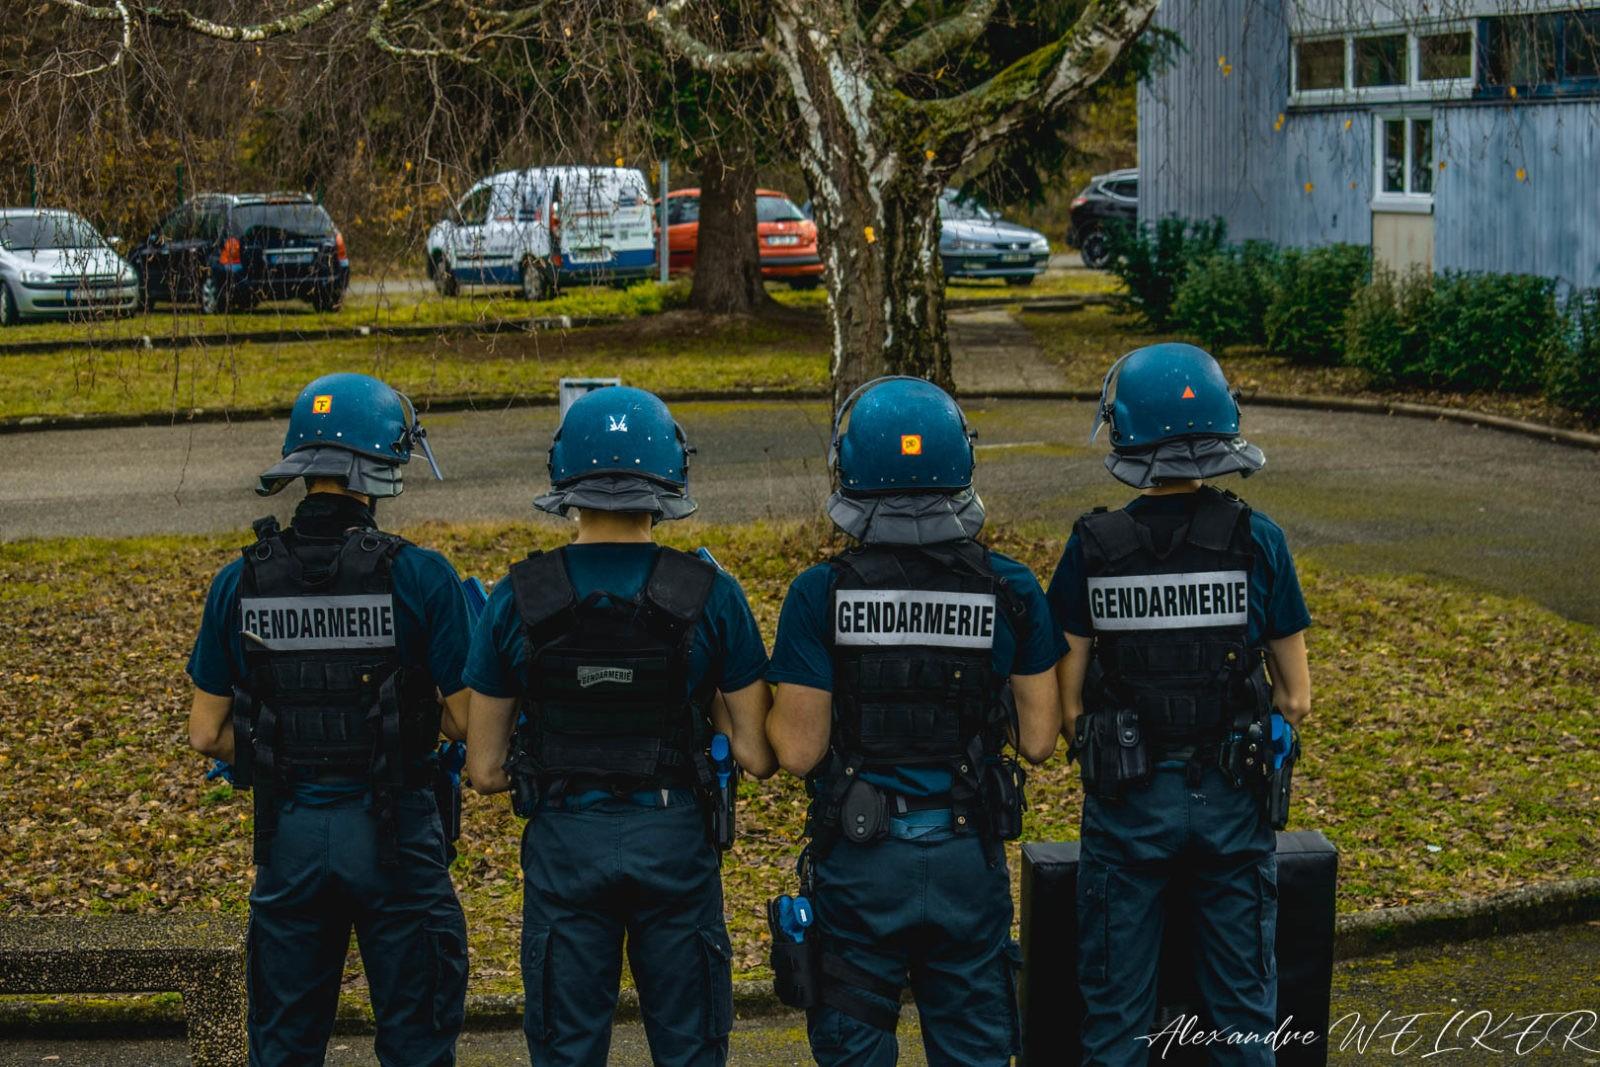 Futurs gendarmes ?